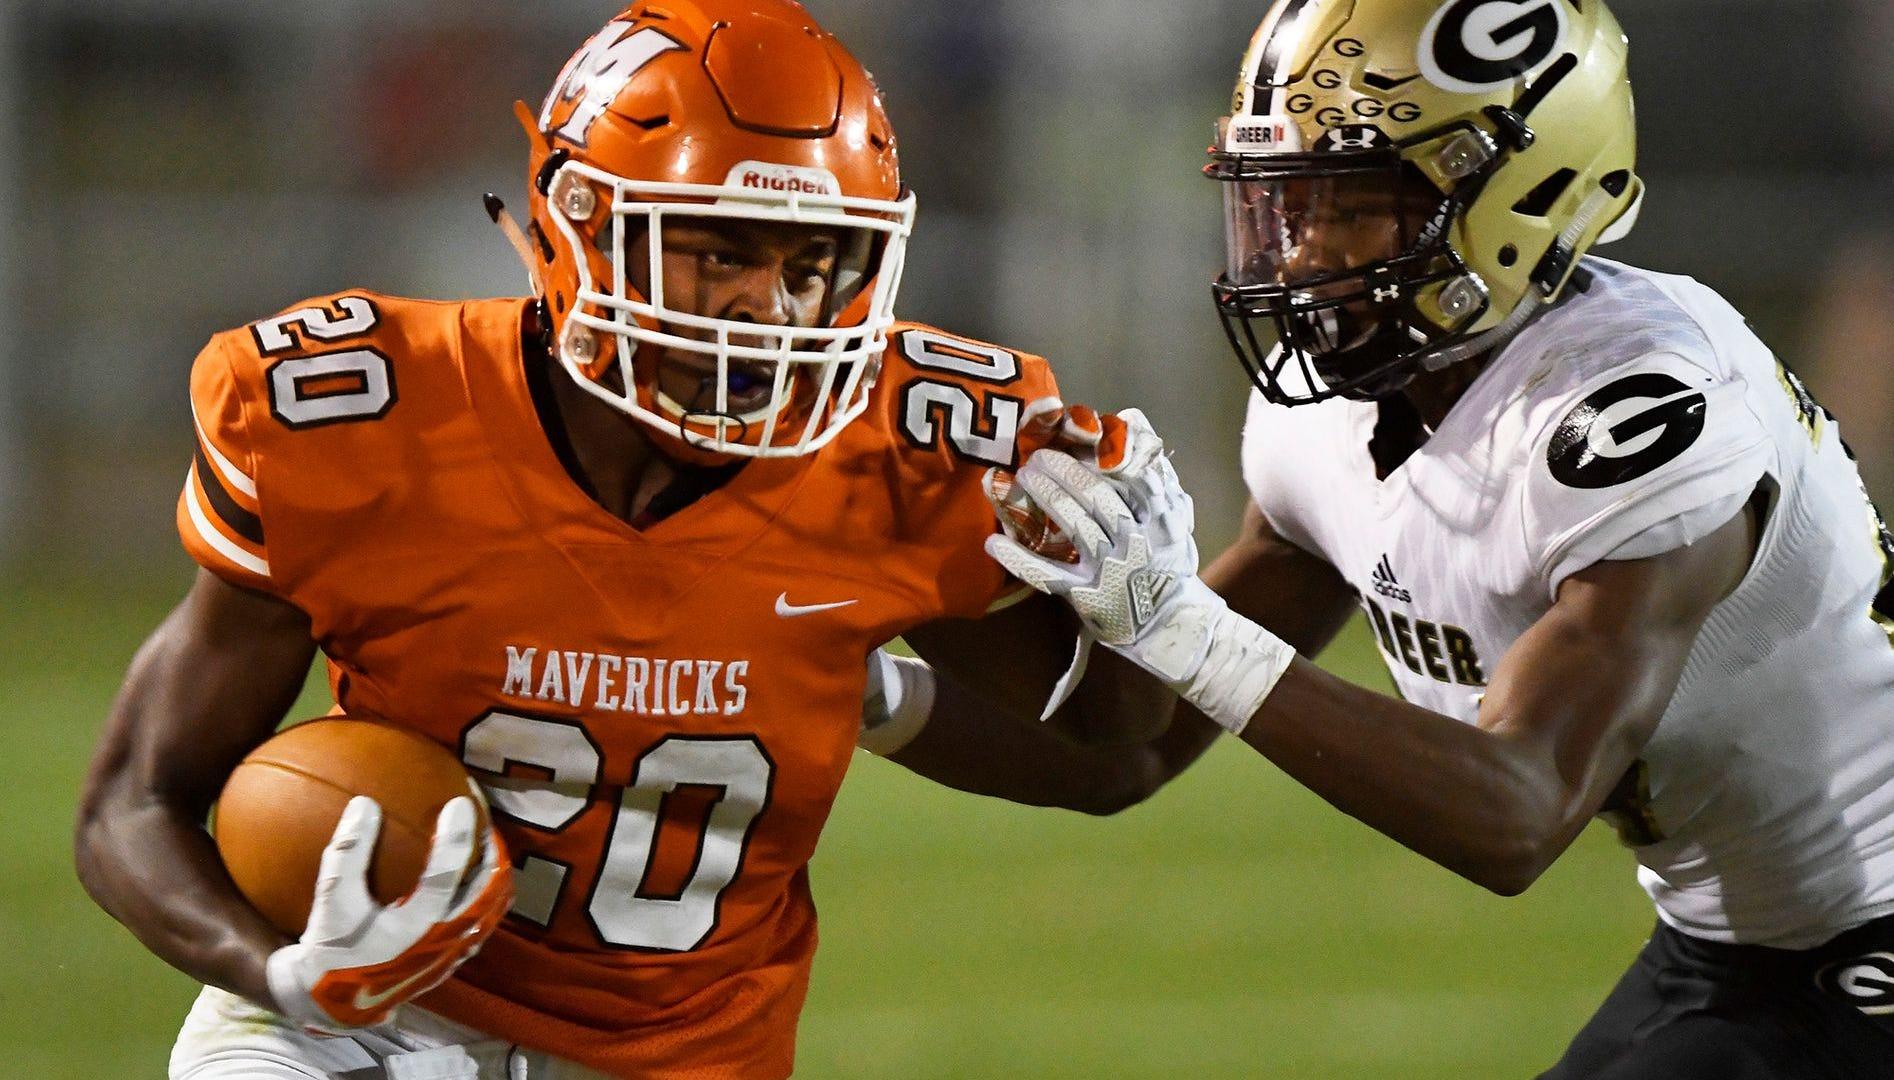 Greenville Area High School Football Scores From Week 4